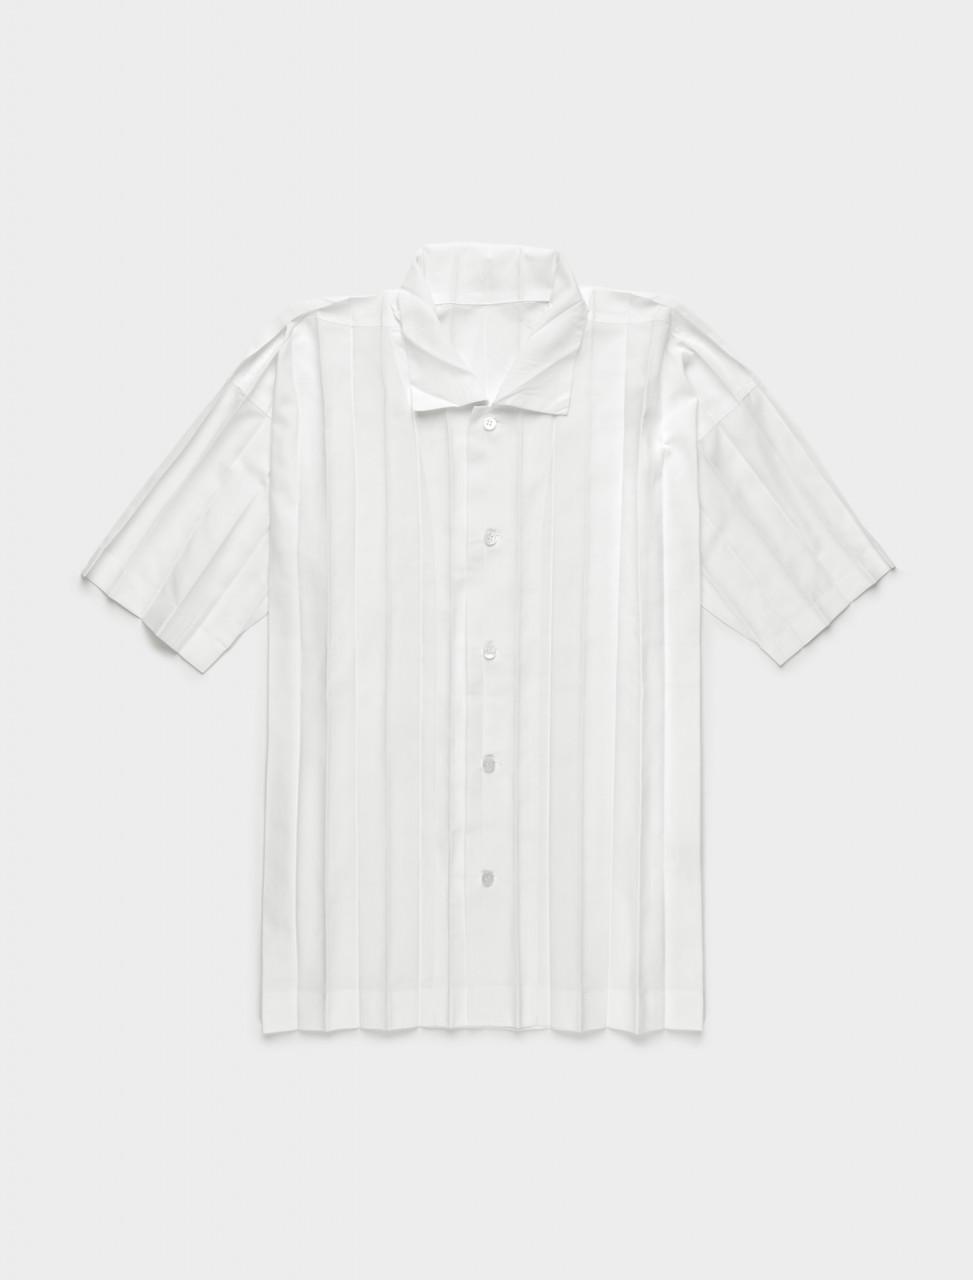 255-HP09FJ015-01 ISSEY MIYAKE HOMME PLISSE PLEATED EDGE SHIRT WHITE